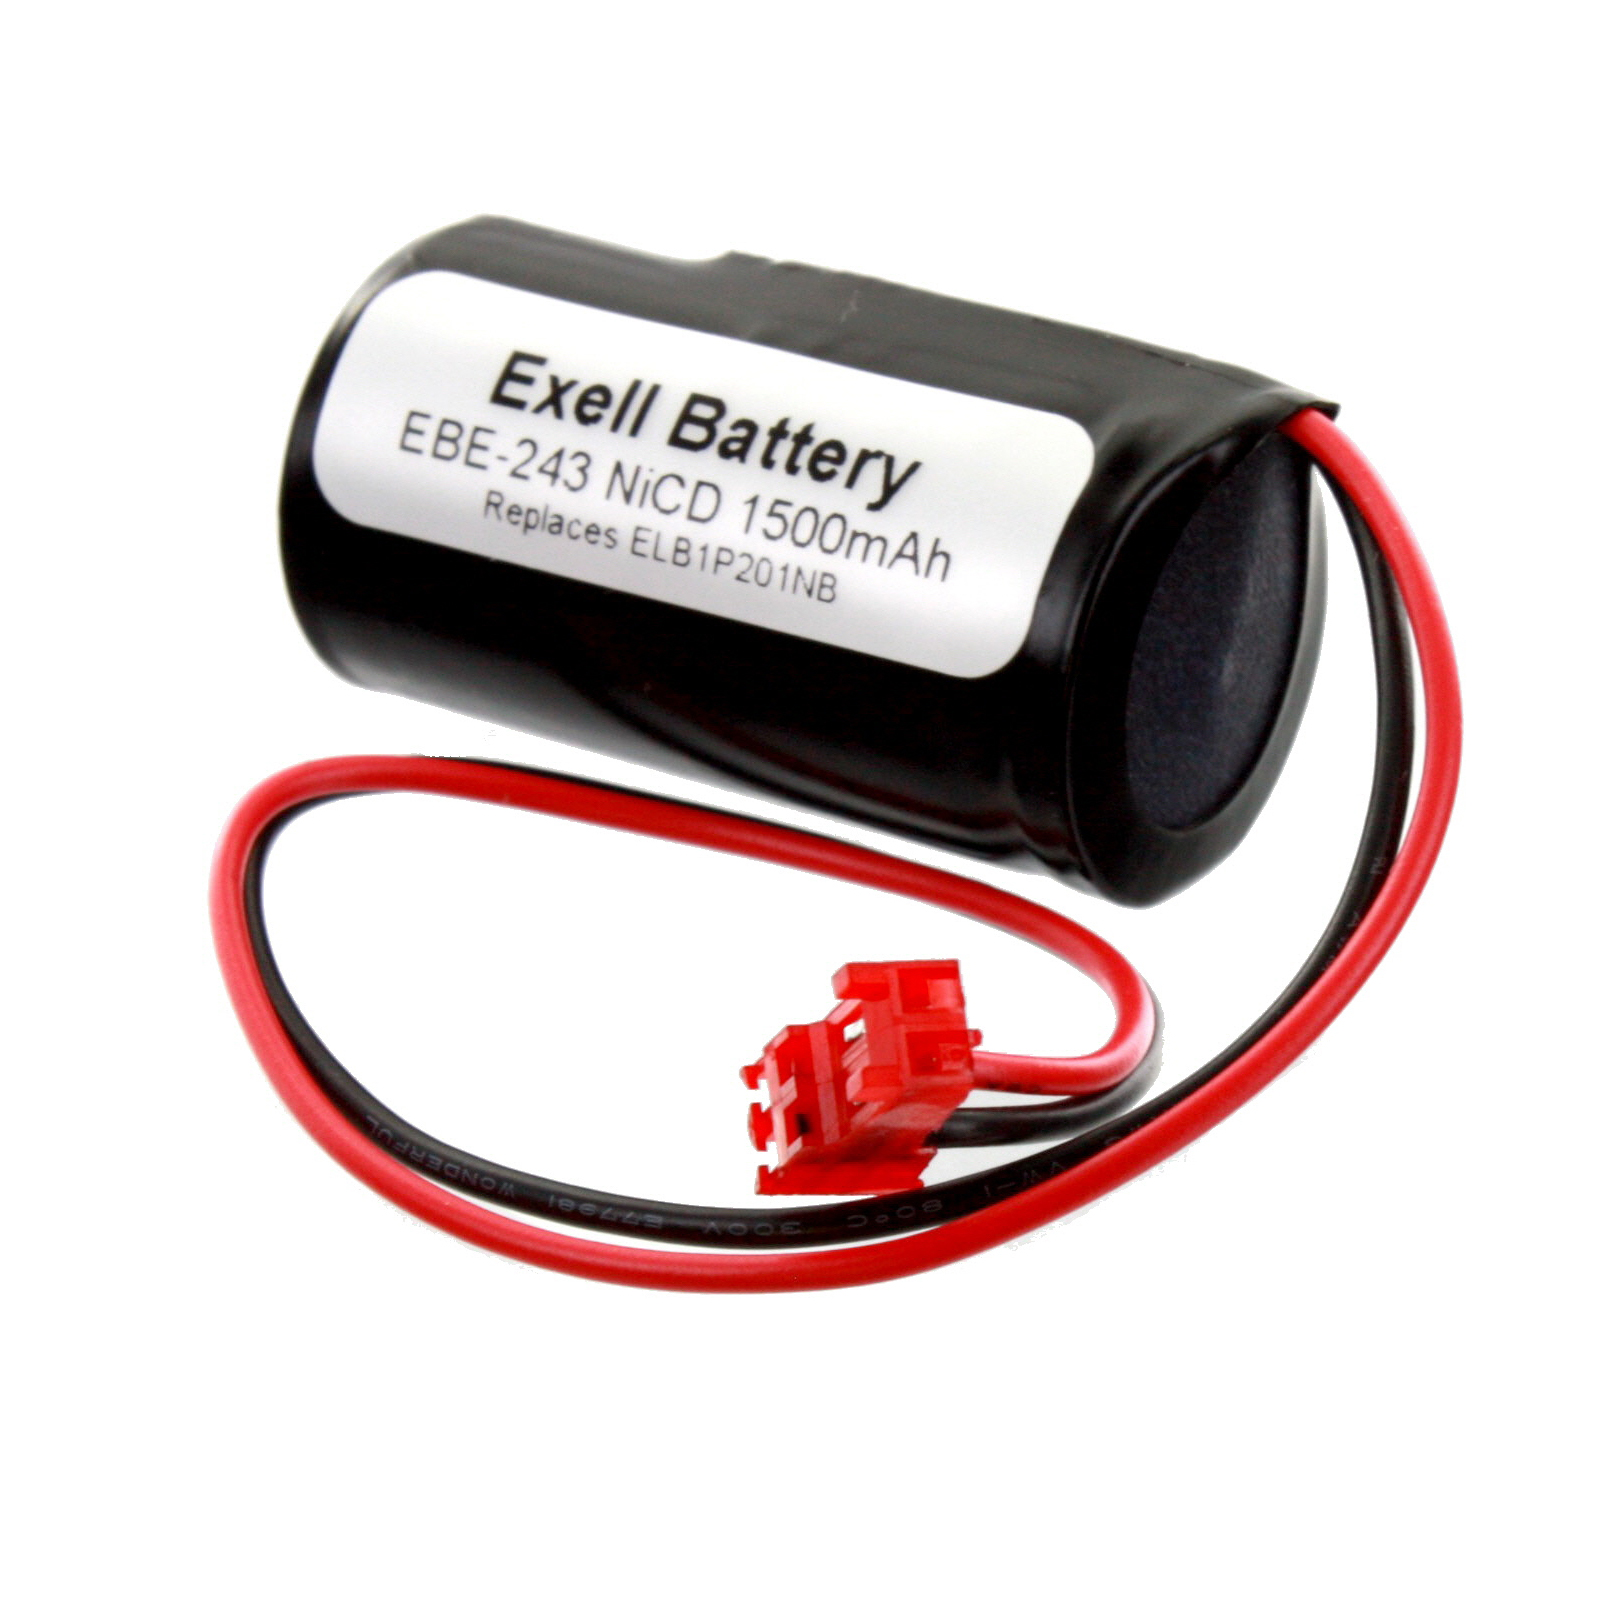 Lithonia Lighting Emergency Light Battery: Emergency Lighting Battery Fits Lithonia 1009S00-MZ